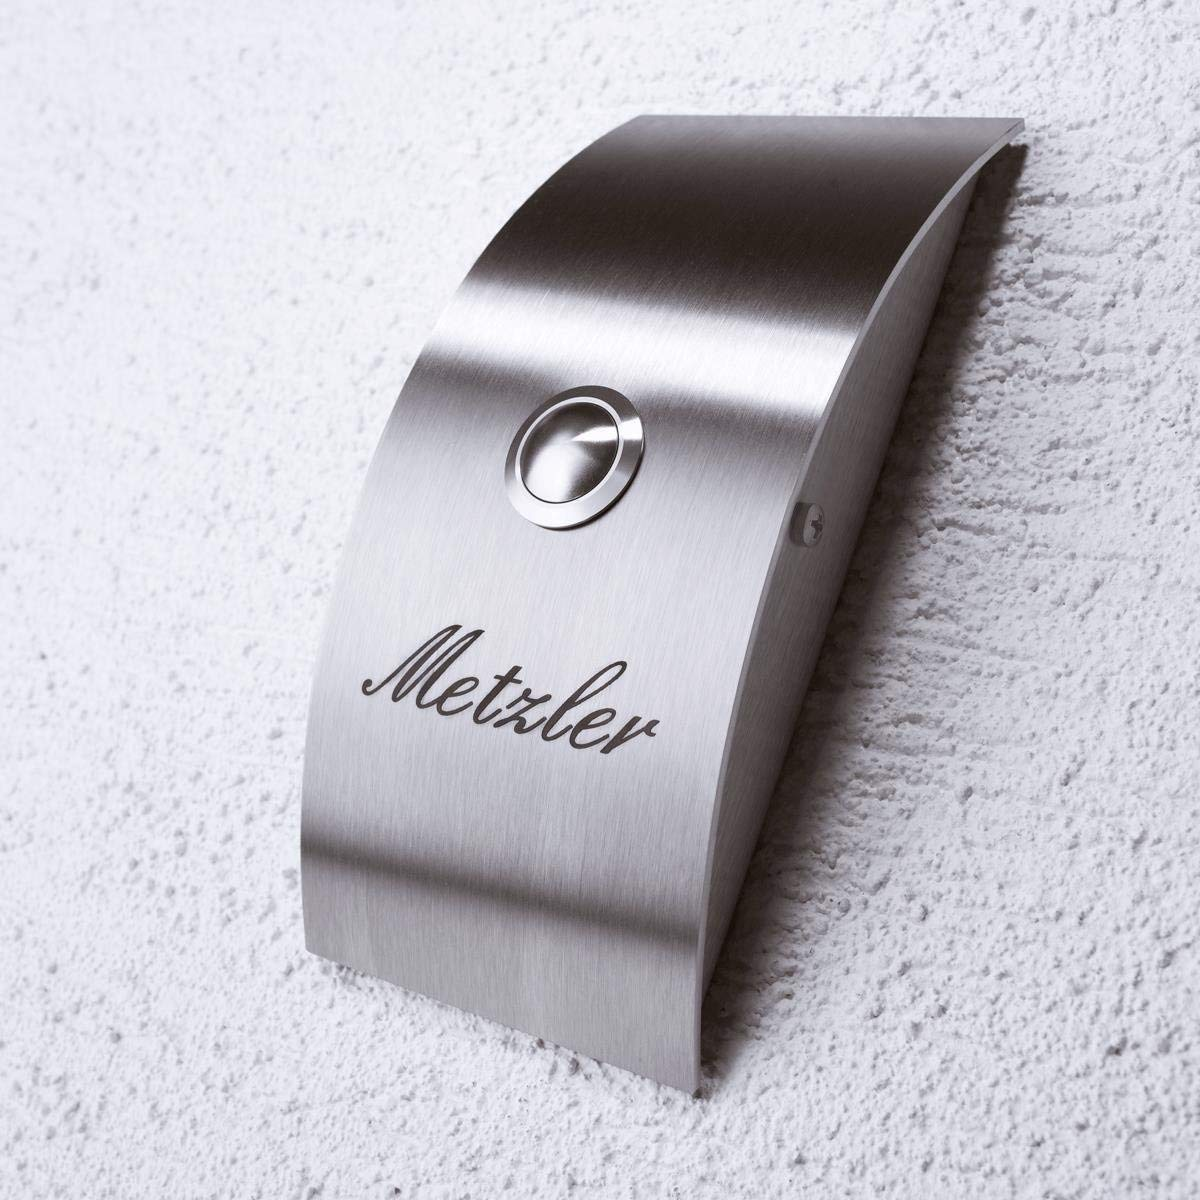 Timbre inal/ámbrico Timbre de puerta inal/ámbrico Acero Inoxidable con grabado. Dise/ño moderno con forma arqueada. Timbre de acero inoxidable, IP67/C/ódigo impermeable tama/ño: 90/x 190/mm